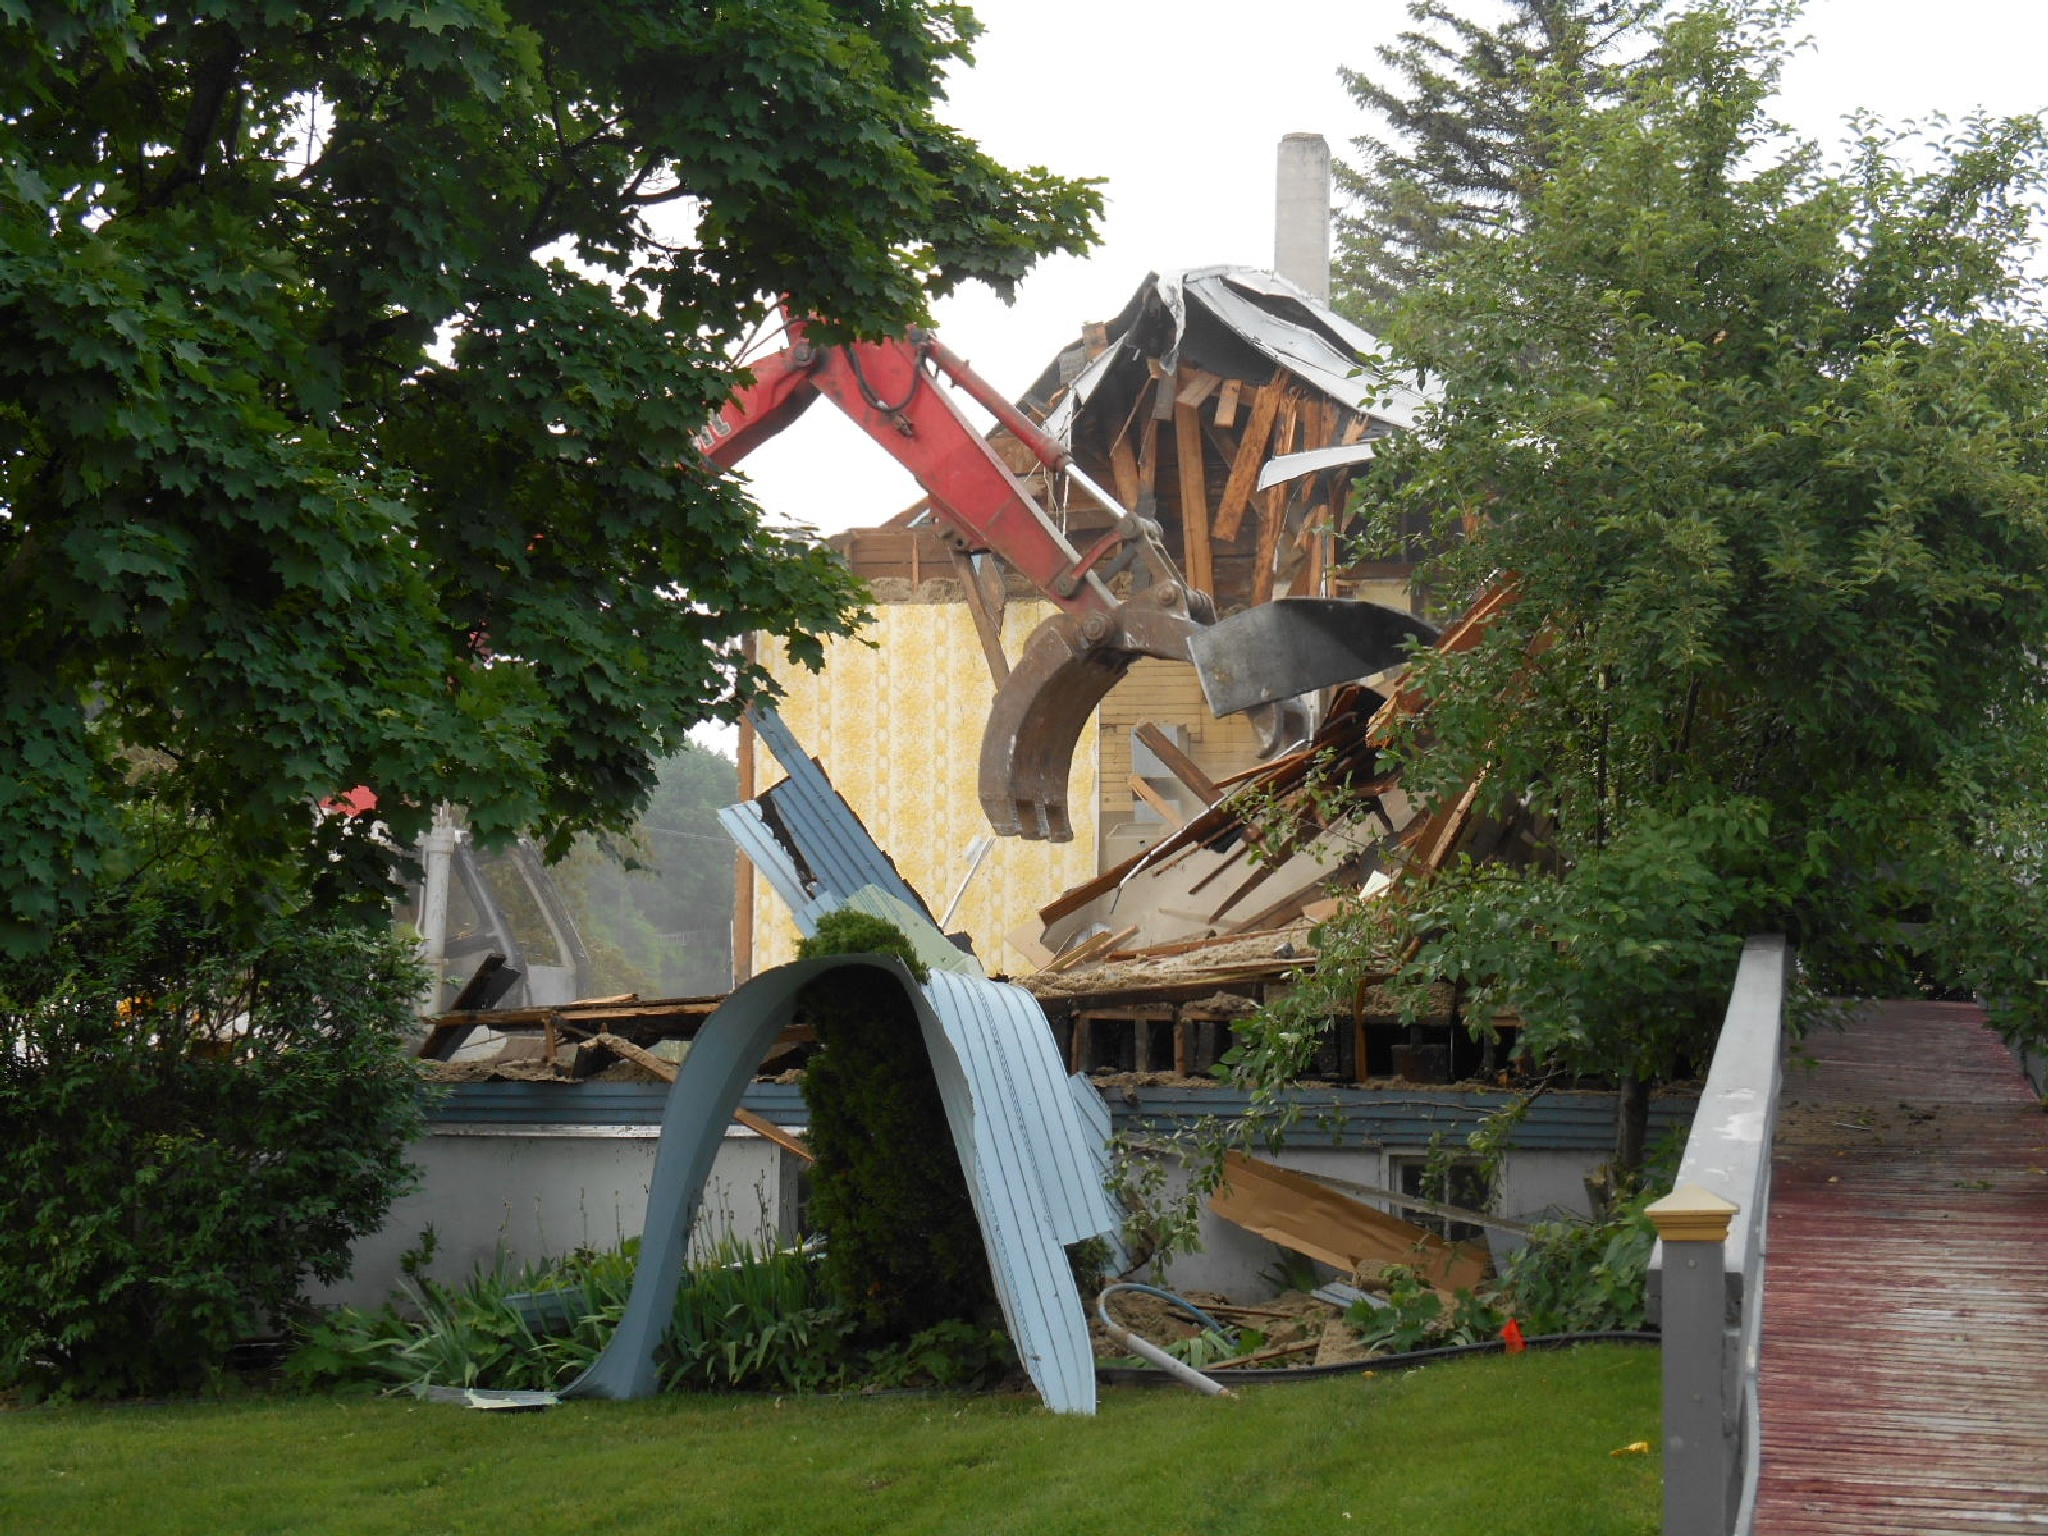 Destruction for progress by jujubwebdesign